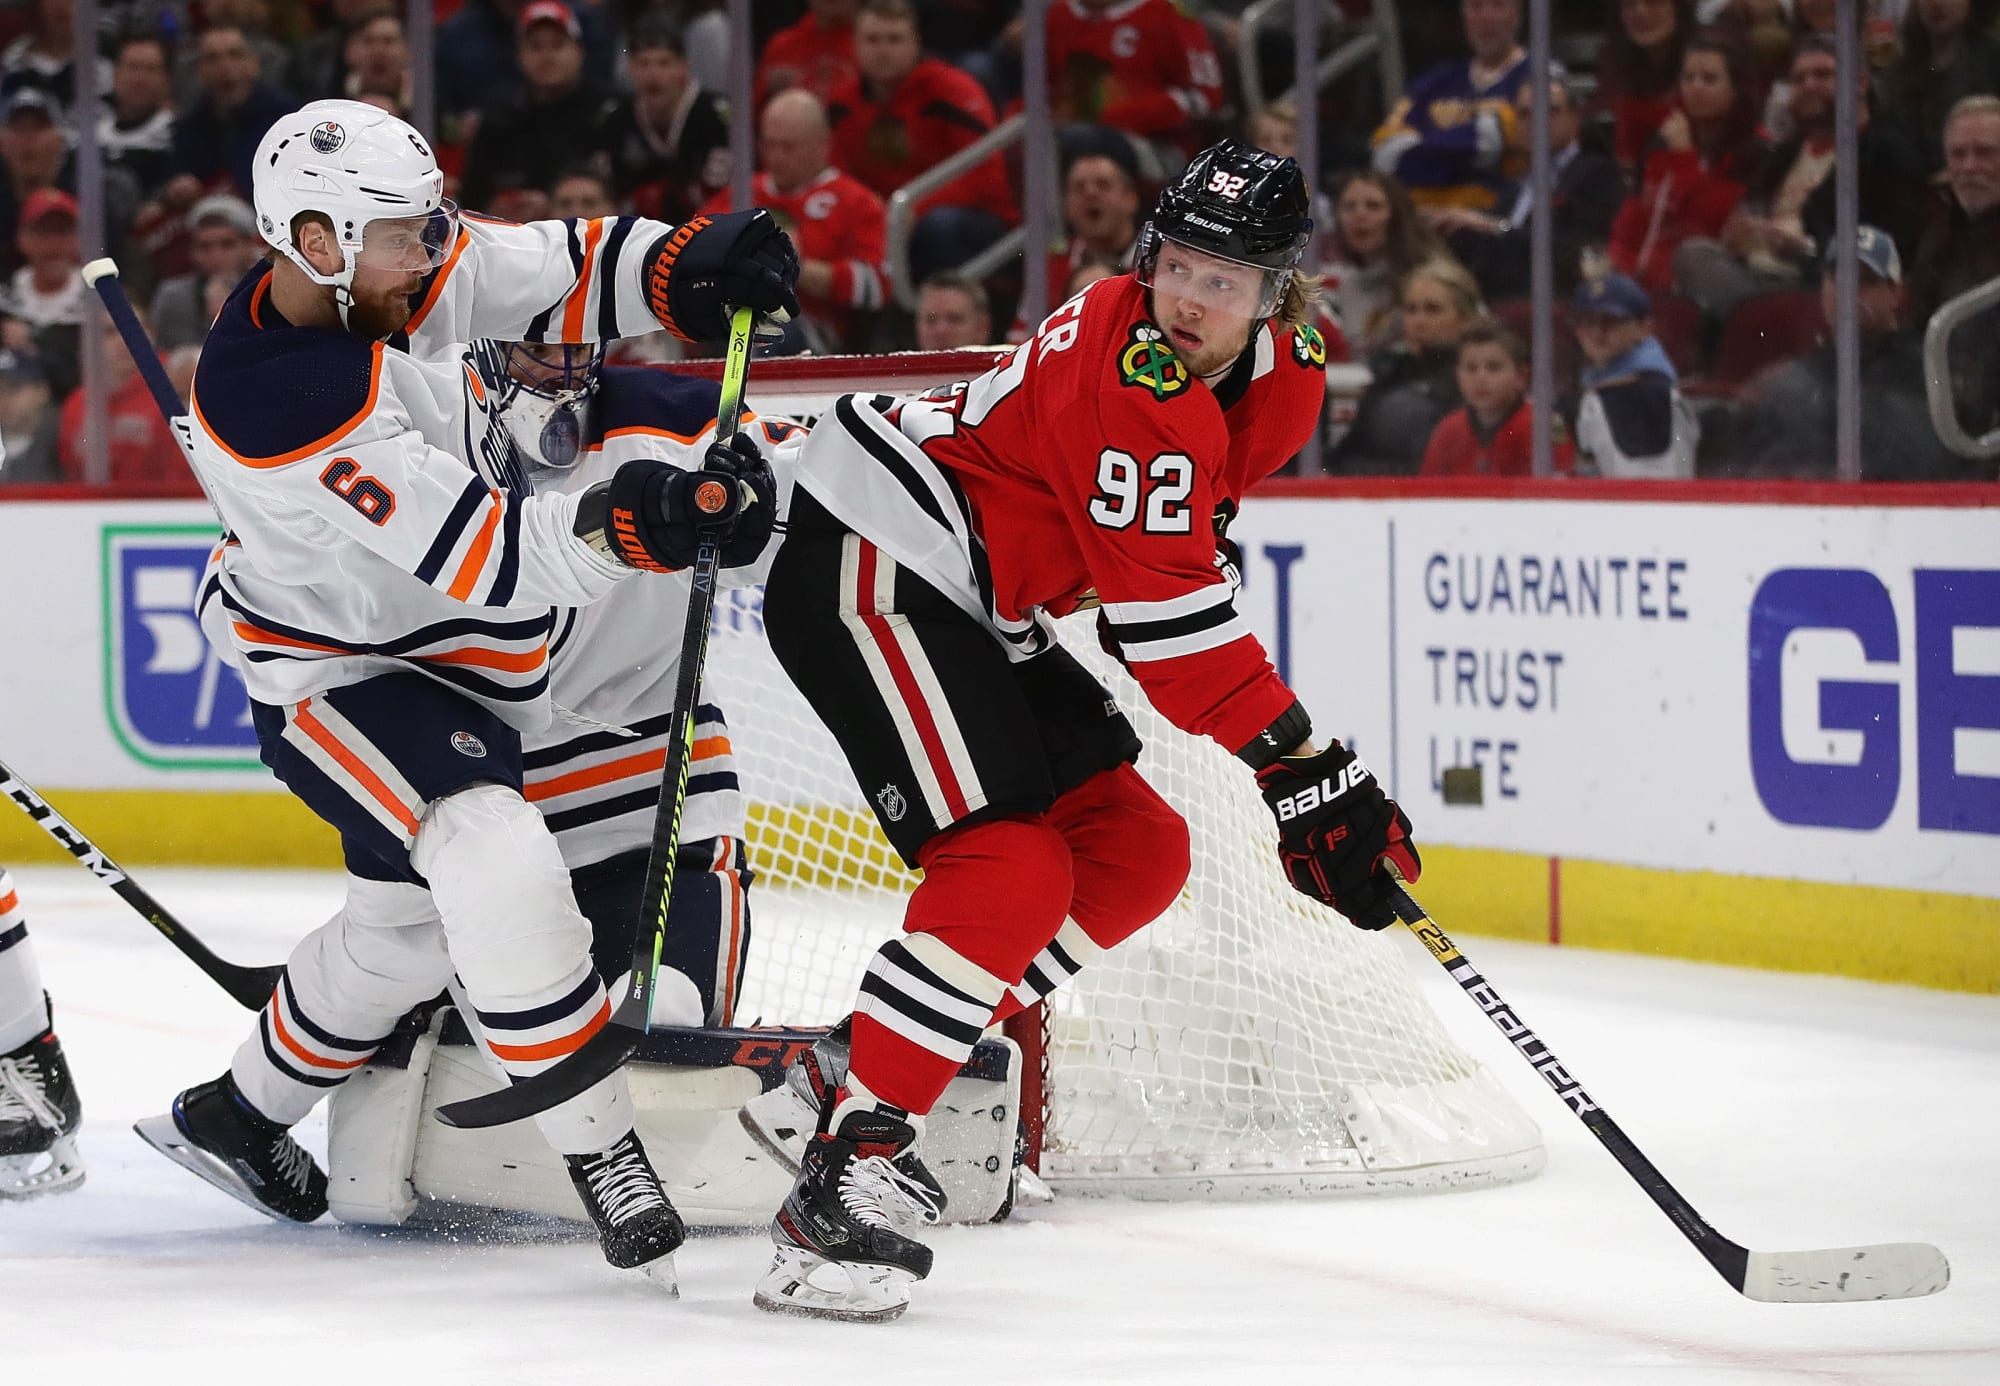 Stanley Cup Playoffs: Edmonton Oilers vs. Chicago Blackhawks Game 4 start time, live stream, TV schedule